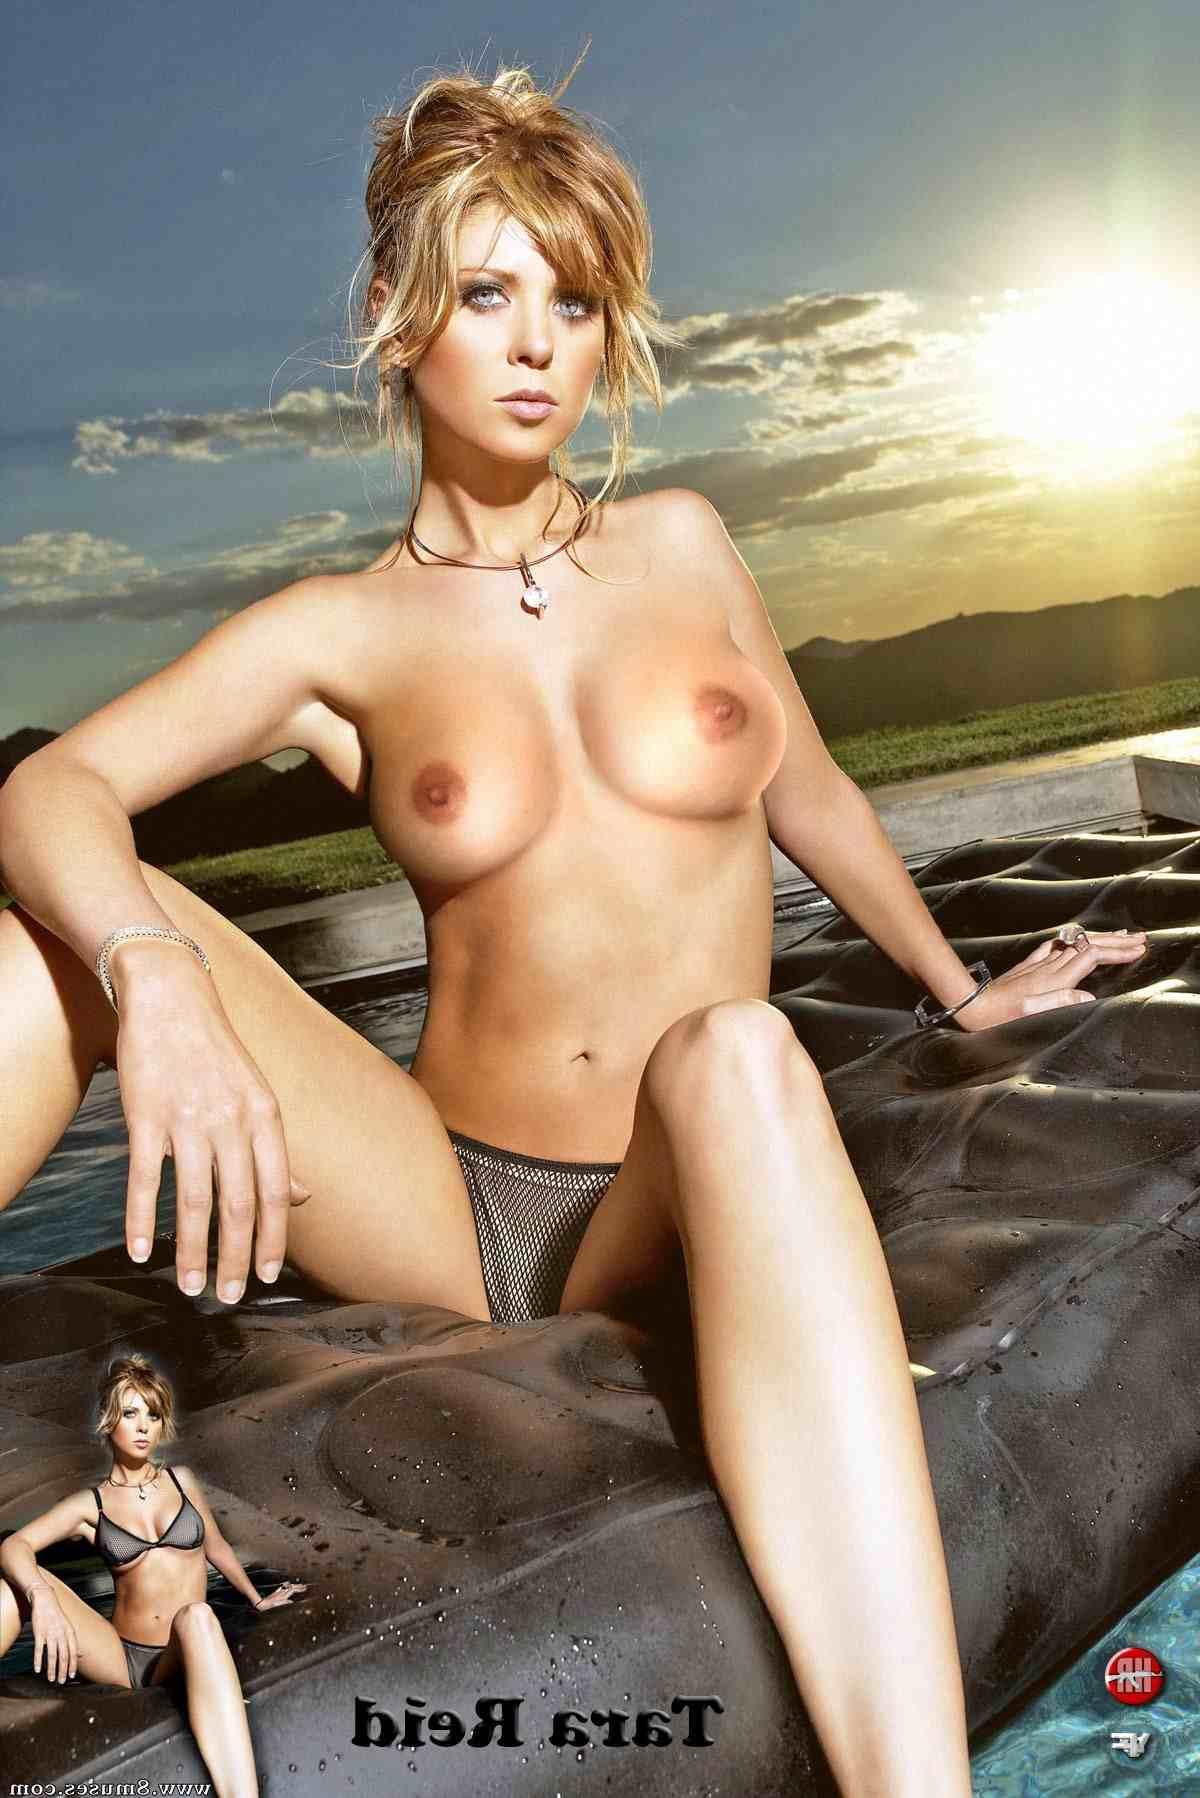 Fake-Celebrities-Sex-Pictures/Tara-Reid Tara_Reid__8muses_-_Sex_and_Porn_Comics_65.jpg